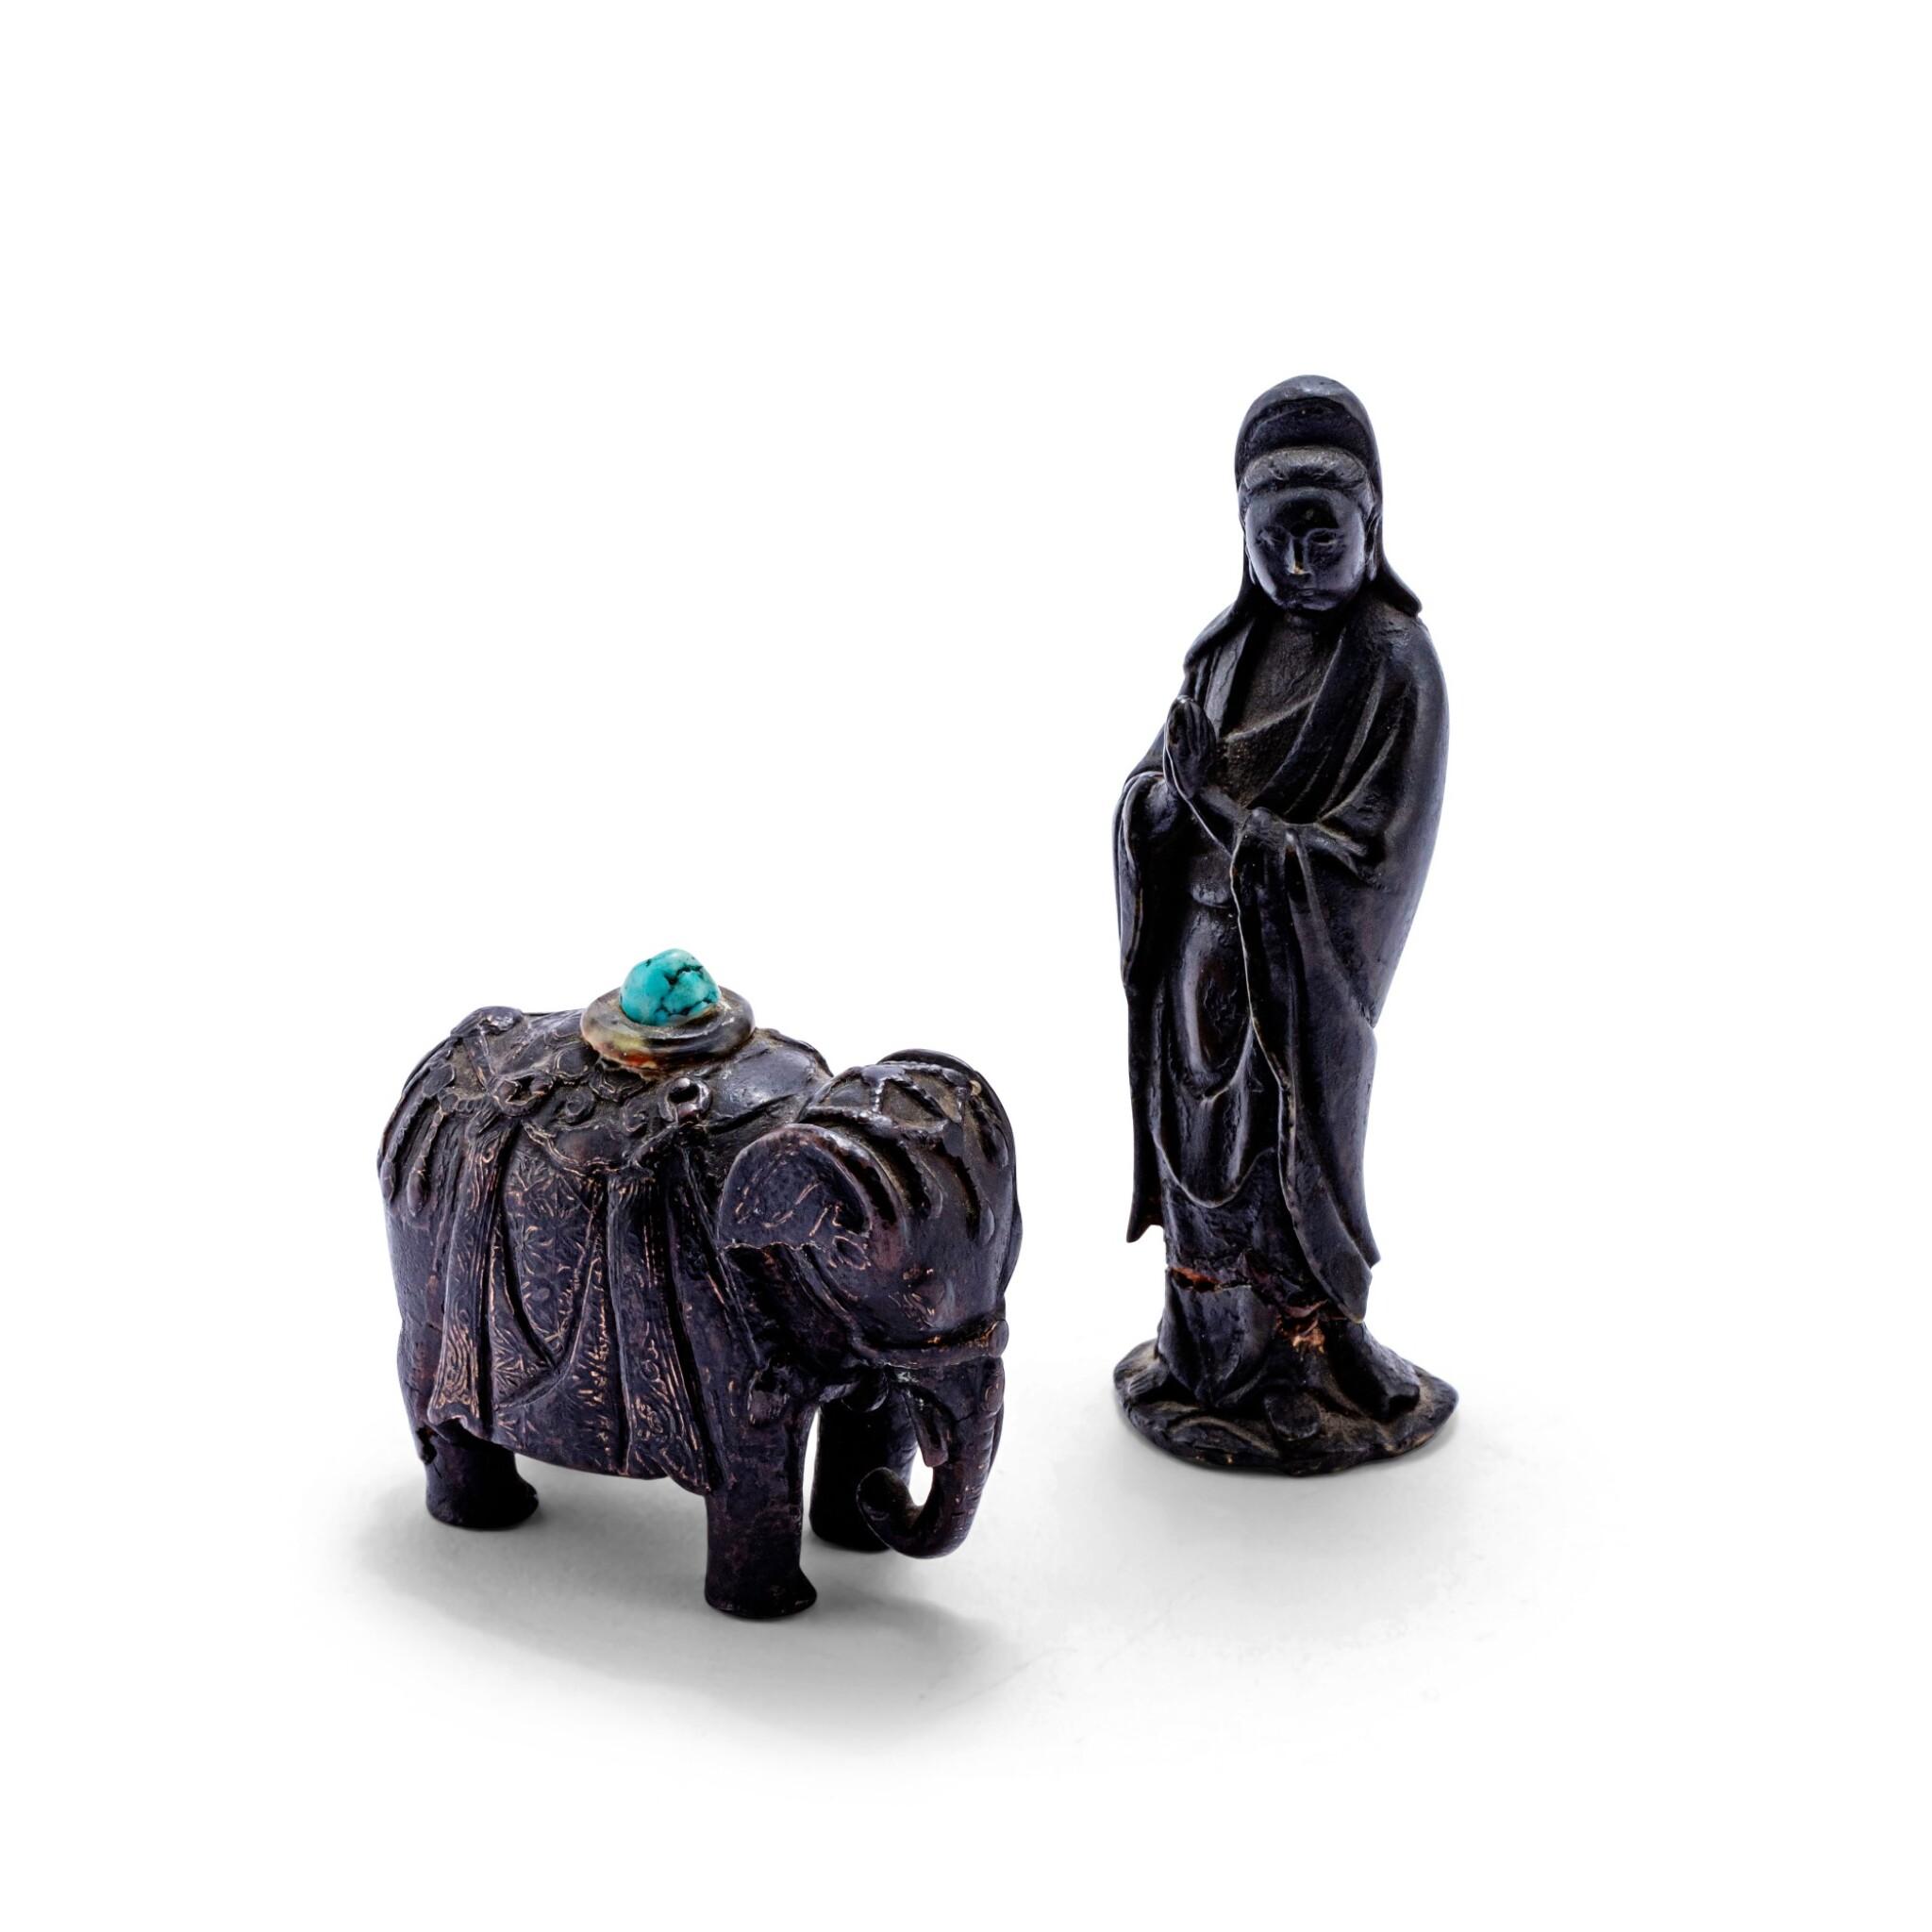 View 1 of Lot 71. Petite statuette de Guanyin en bronze patiné et presse-papier en forme d'éléphant Dynastie Qing, XVIIE- XVIIIE siècle | 清十七至十八世紀 銅觀音立像 及 銅象擺件 | A small bronze figure of Guanyin and a bronze 'elephant' paperweight, Qing Dynasty, 17th-18th century .